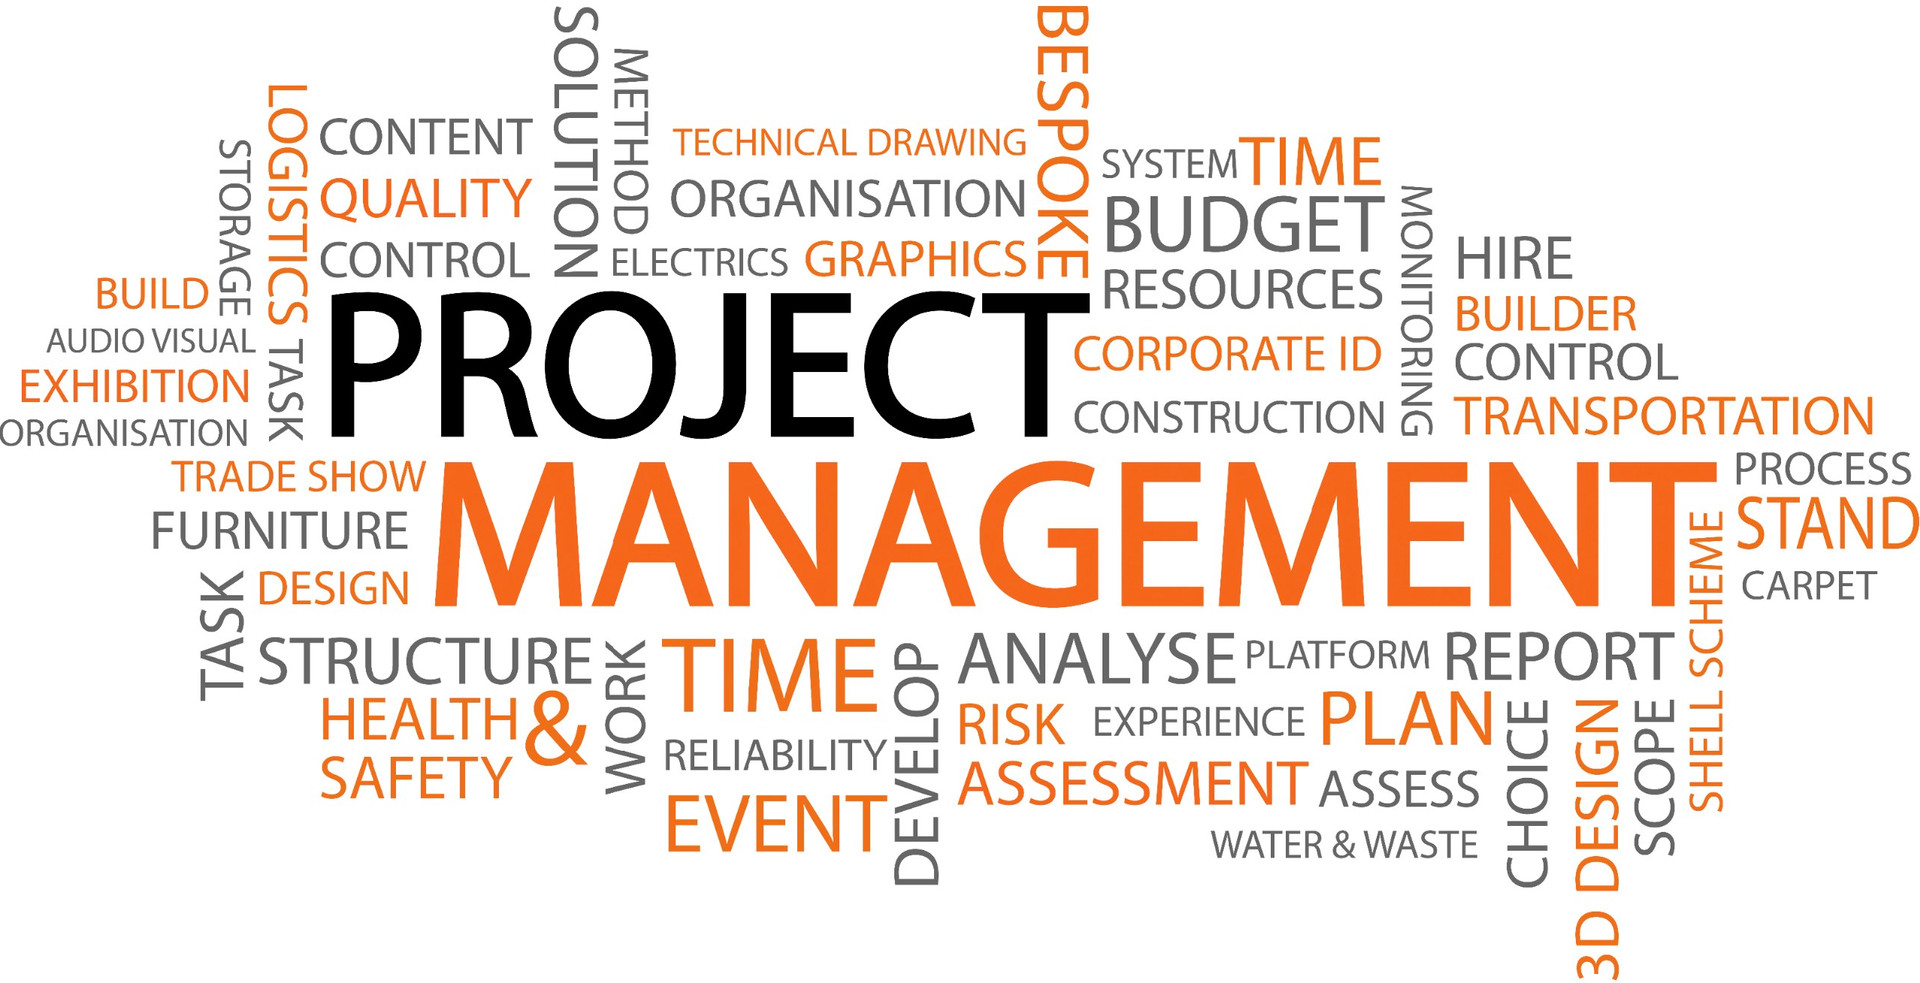 projectmanagement.jpg